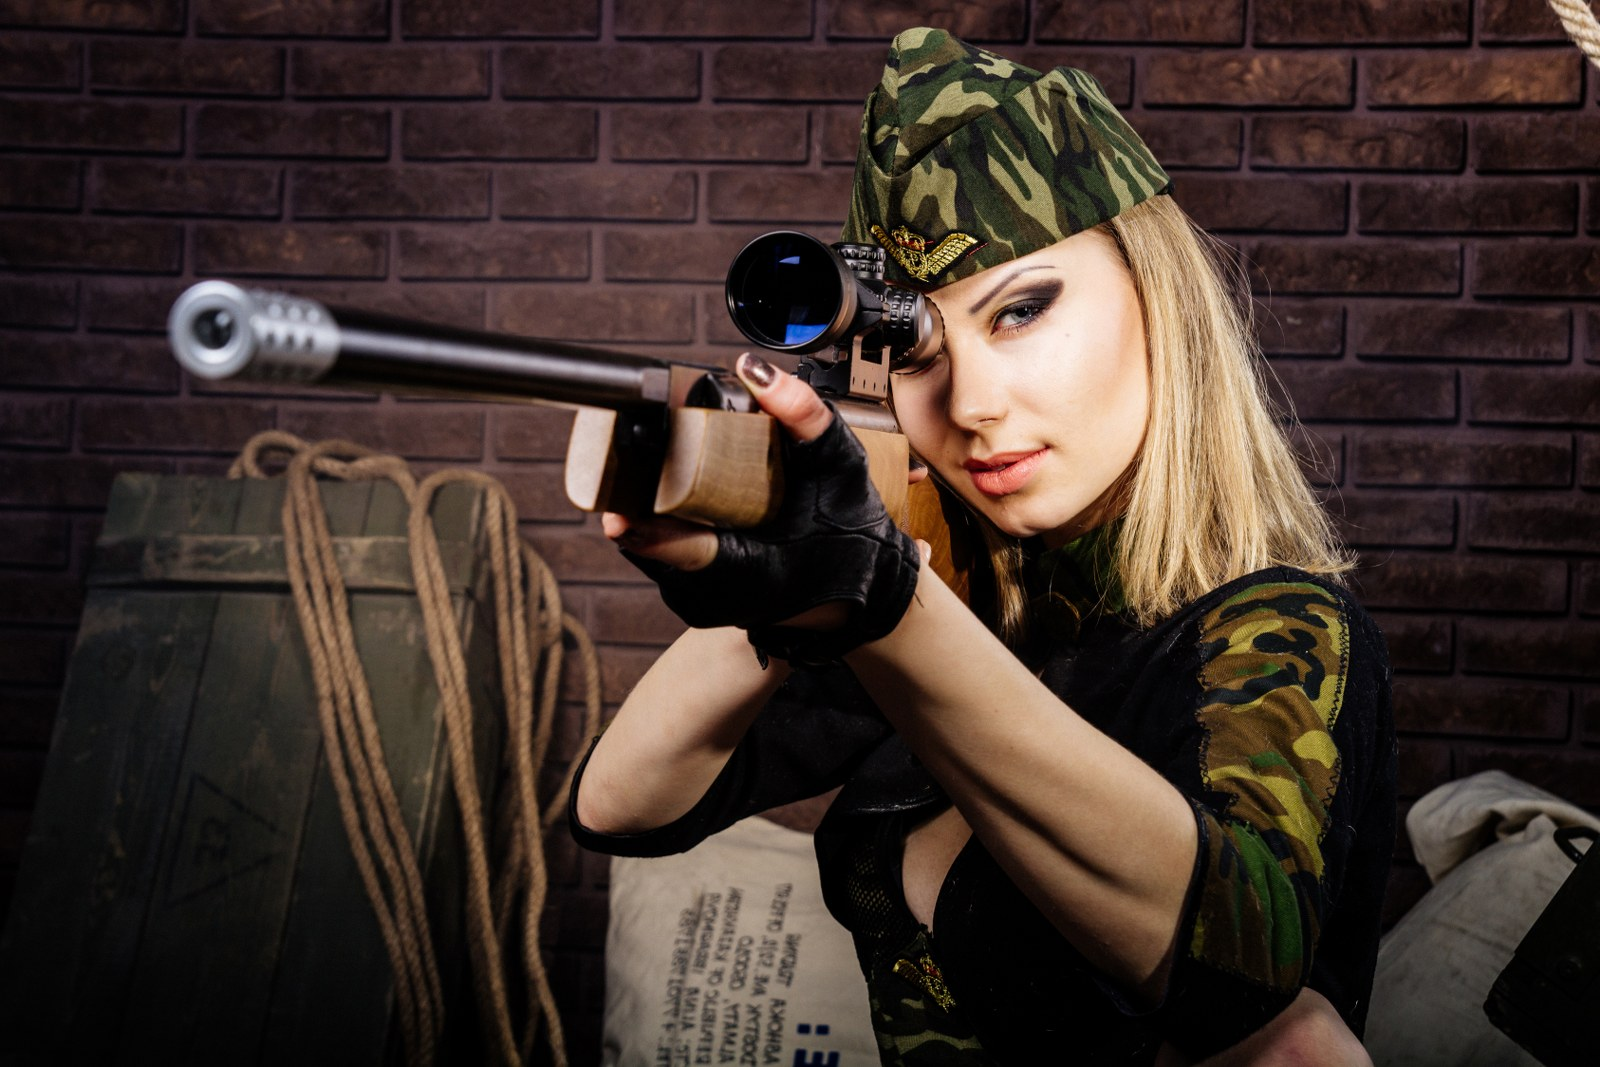 Gun Shooting Package 1 - 25 Bullets x Sig Sauer X5 9mm